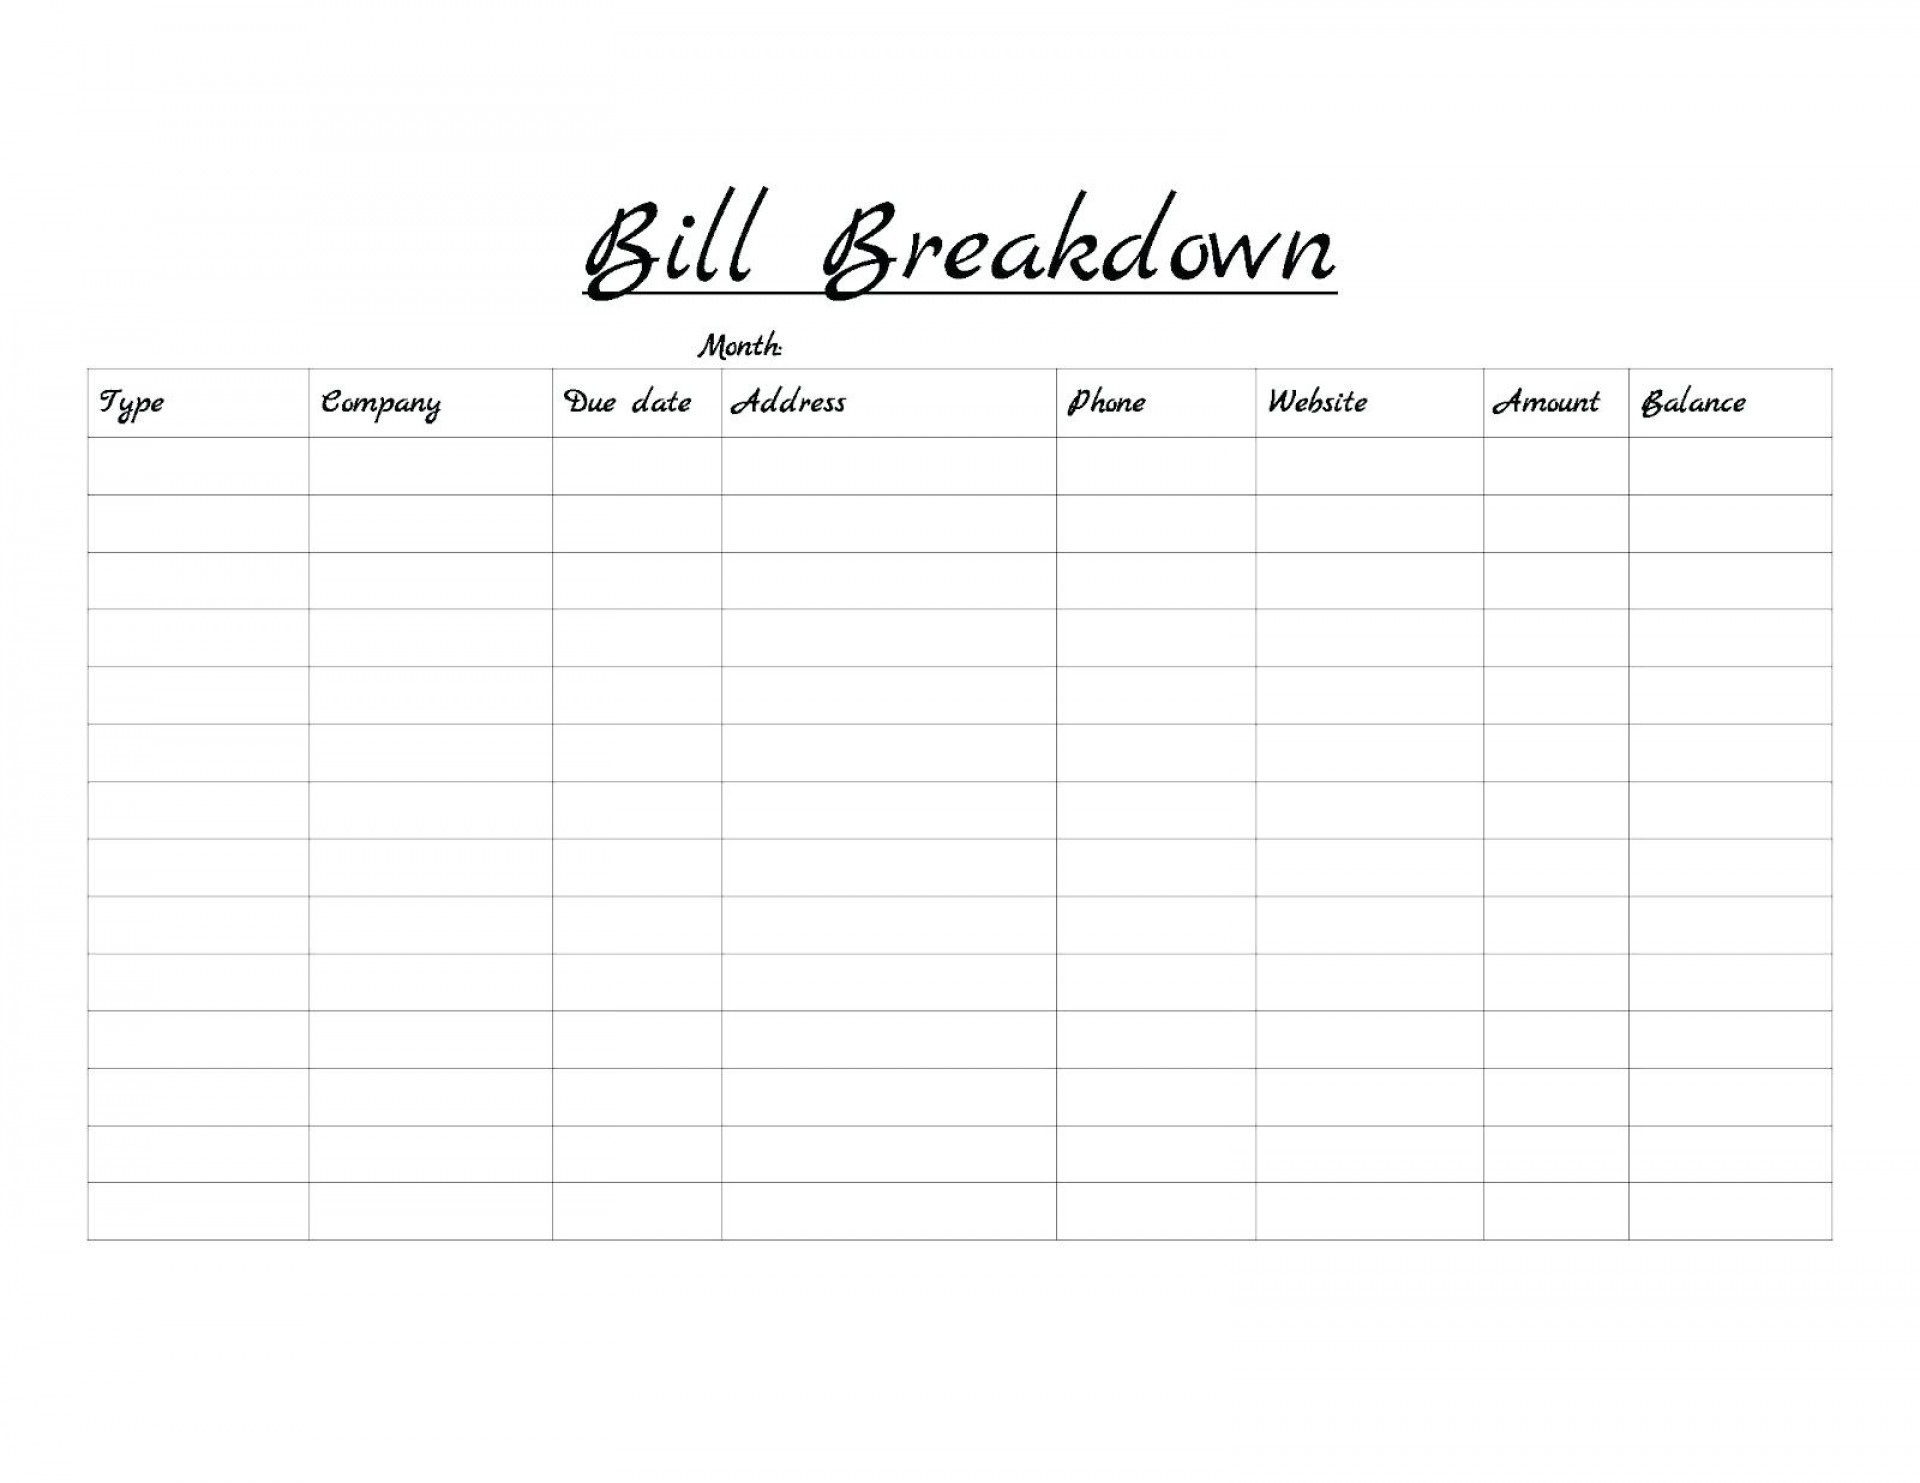 Monthly Bill Template Free Printable   Calendar Template intended for Bill Payment Calendar Printable